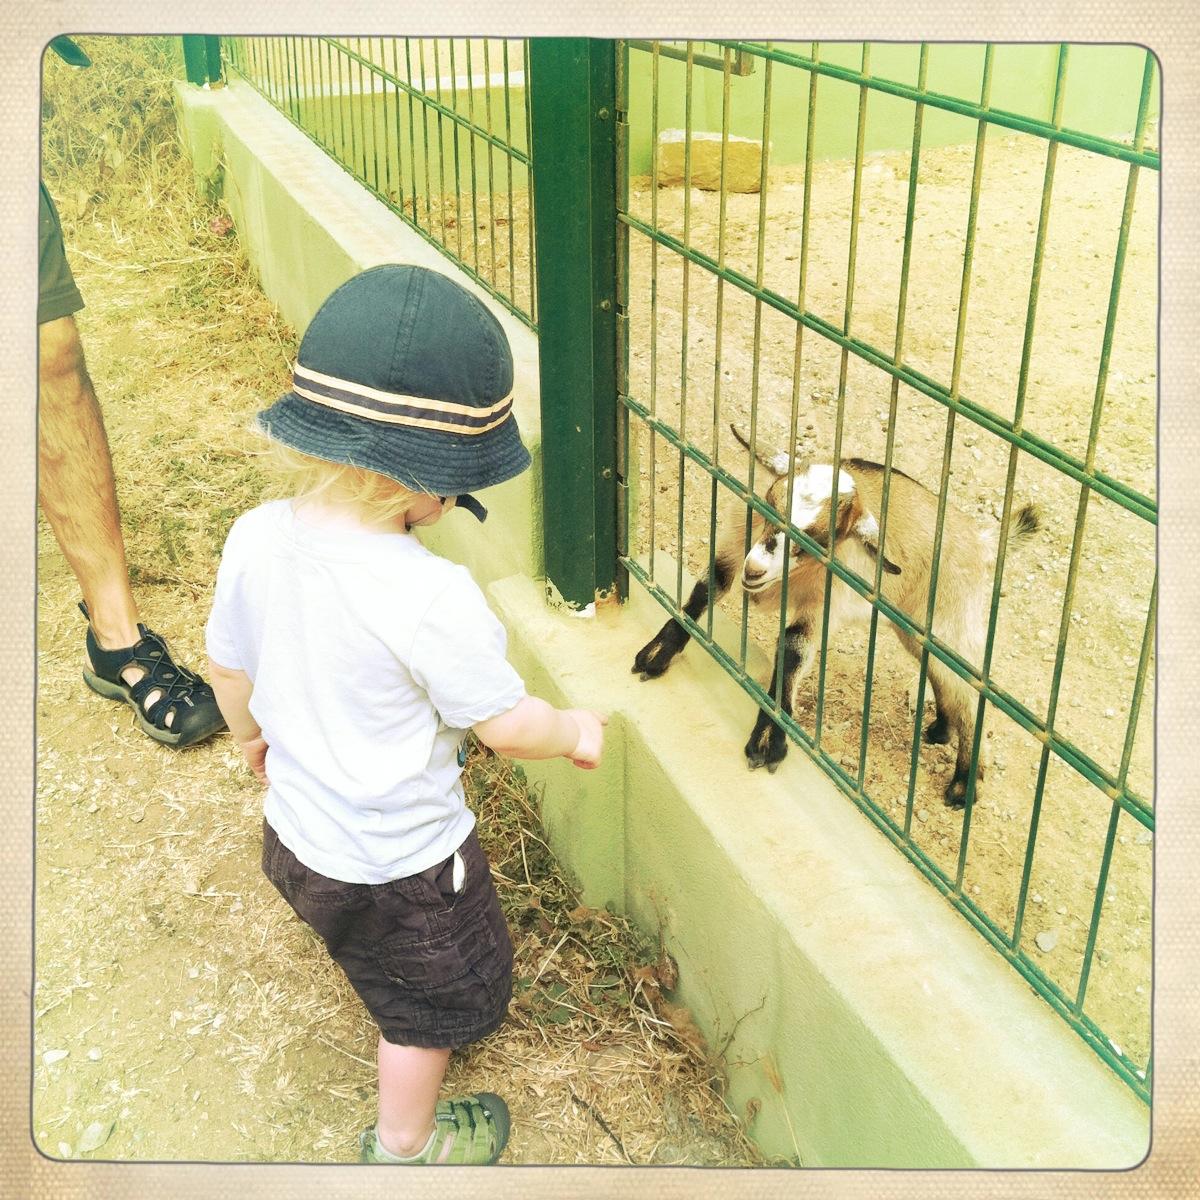 Feeding the baby goats at animal garden